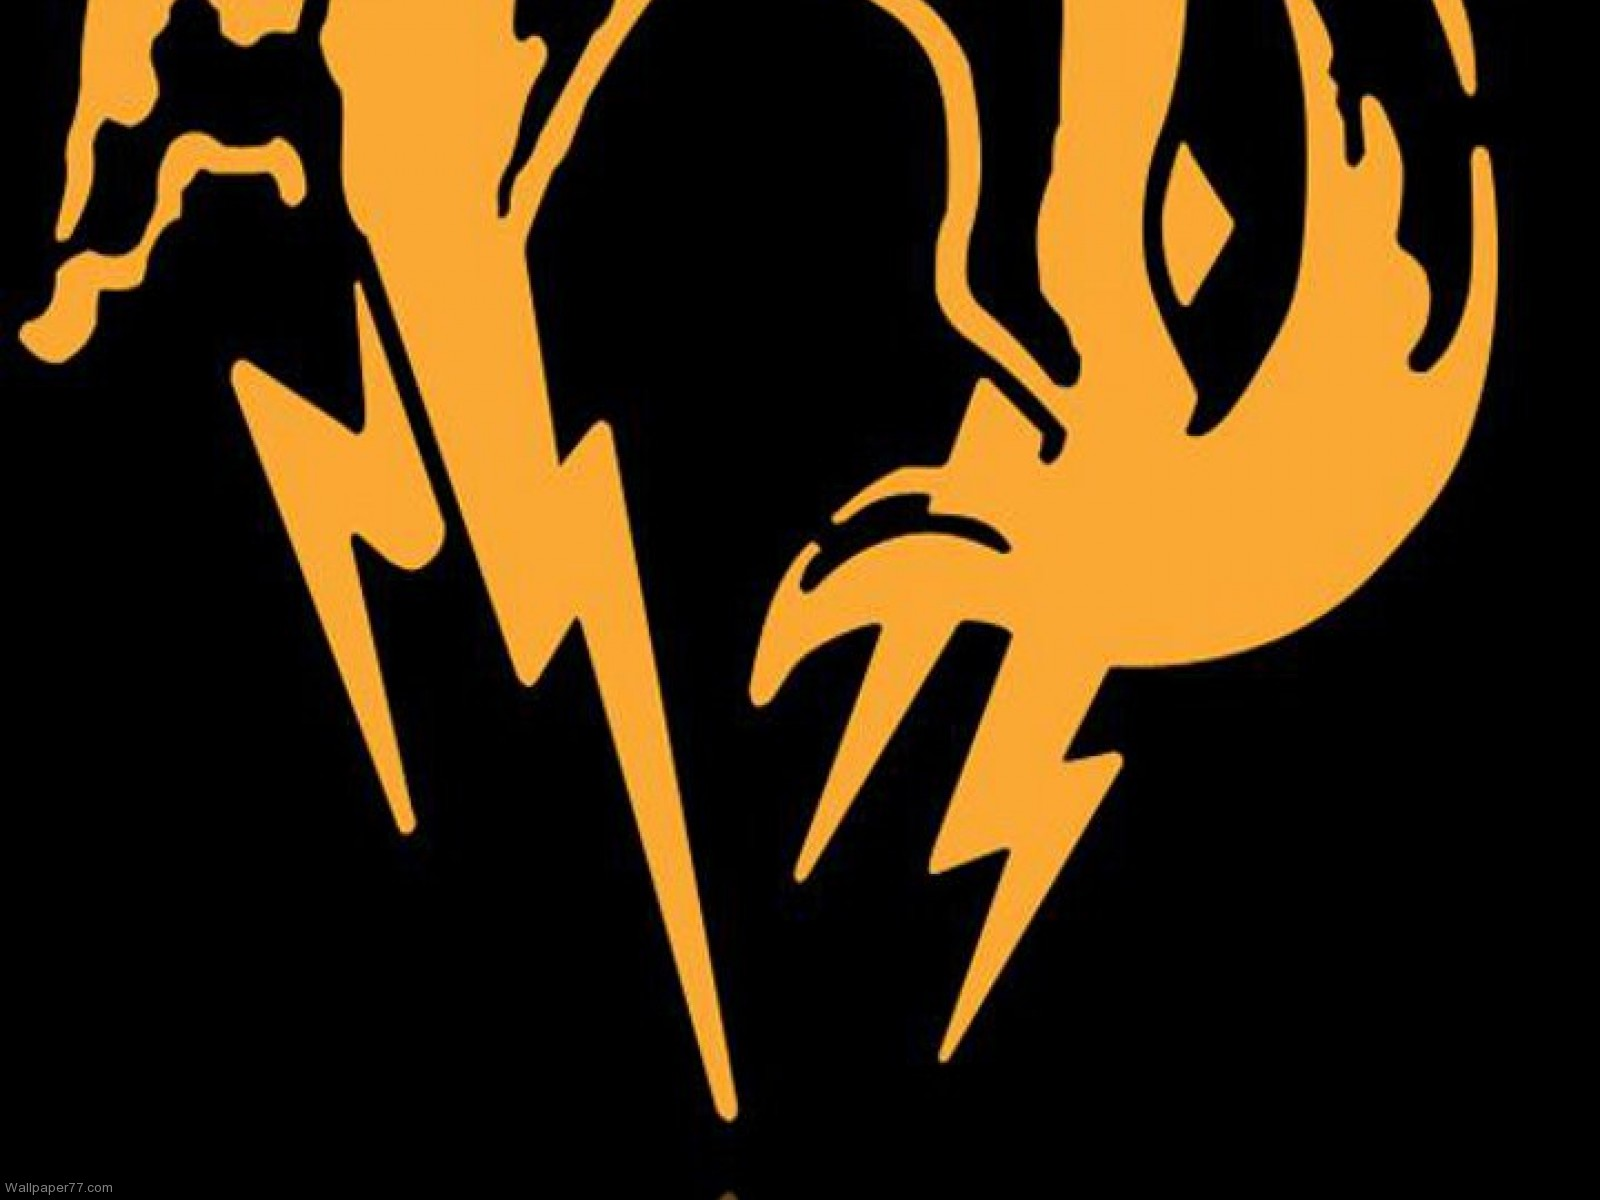 Foxhound Metal Gear Logo 2 Solid 1600x1200